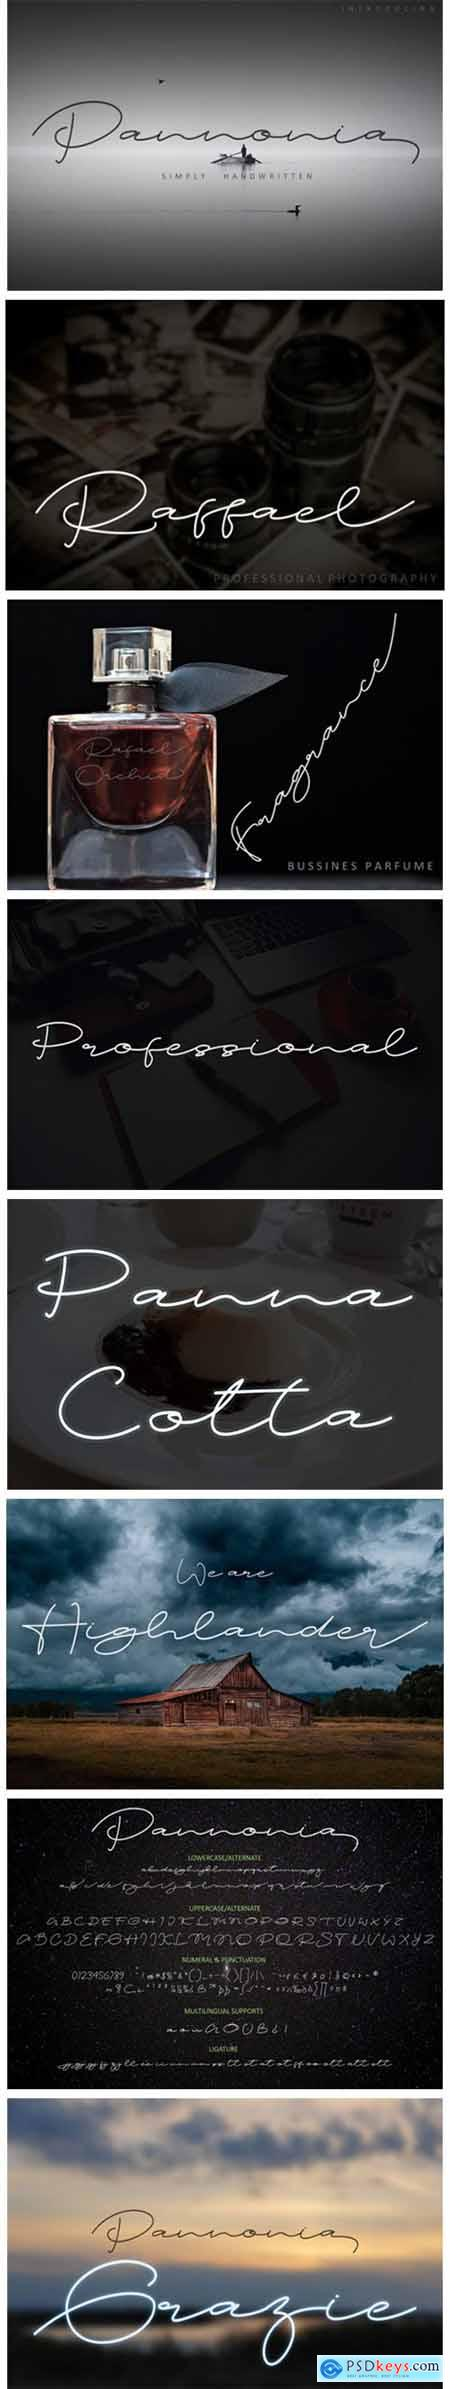 Pannonia Font